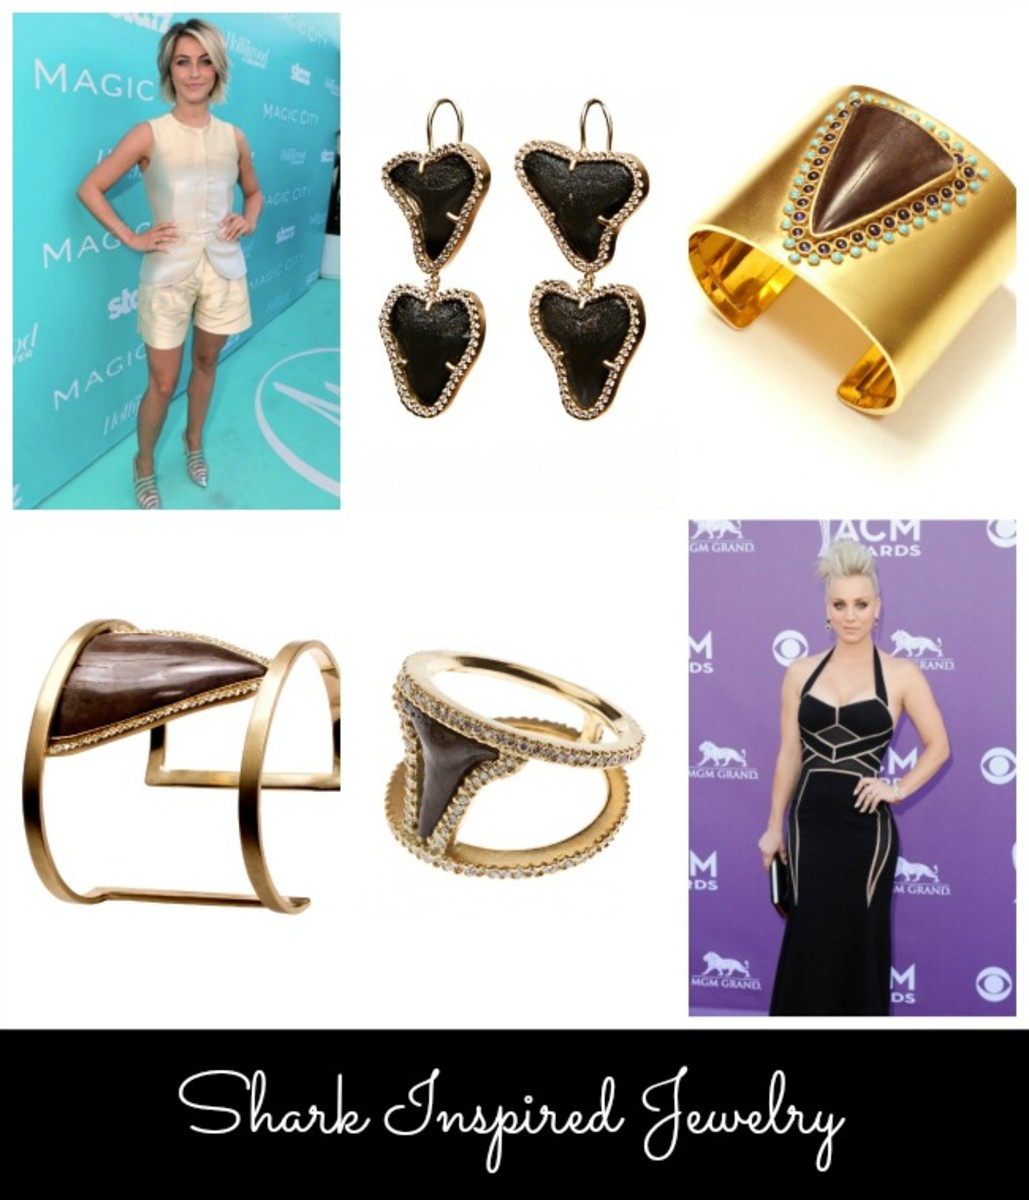 sharkinspiredjewelry